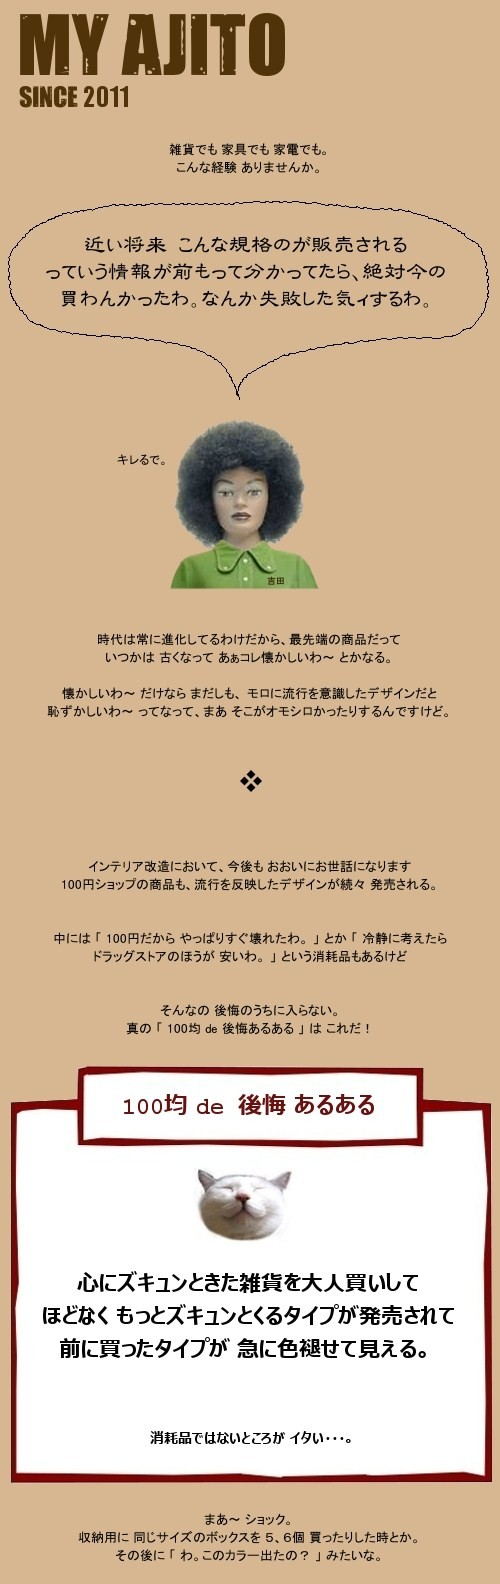 seri_f_0.jpg